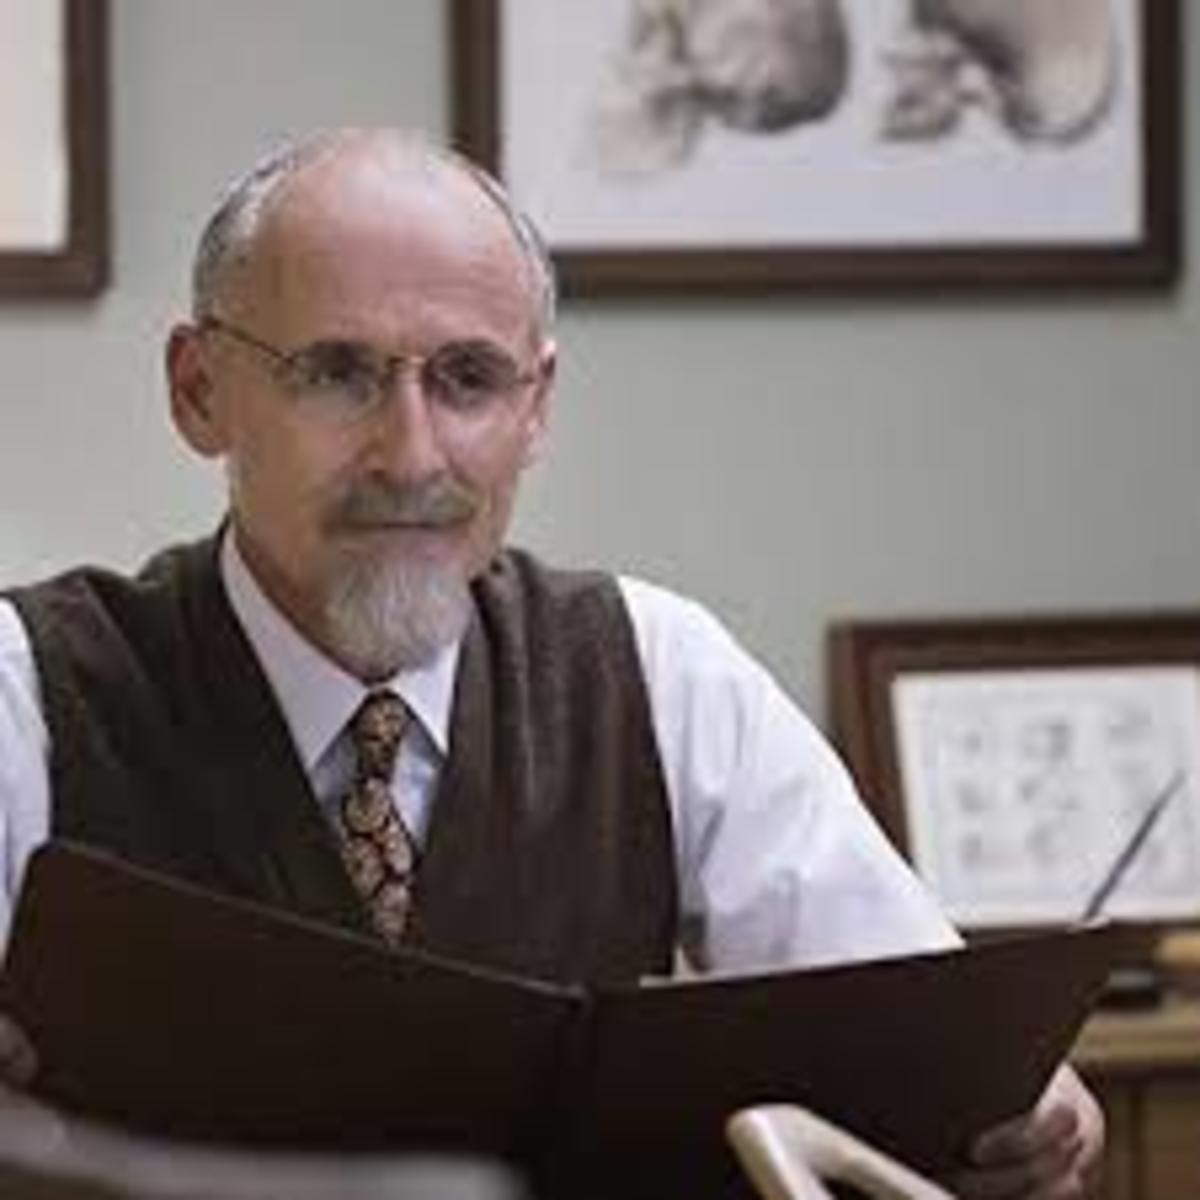 Dr. Walter Freeman